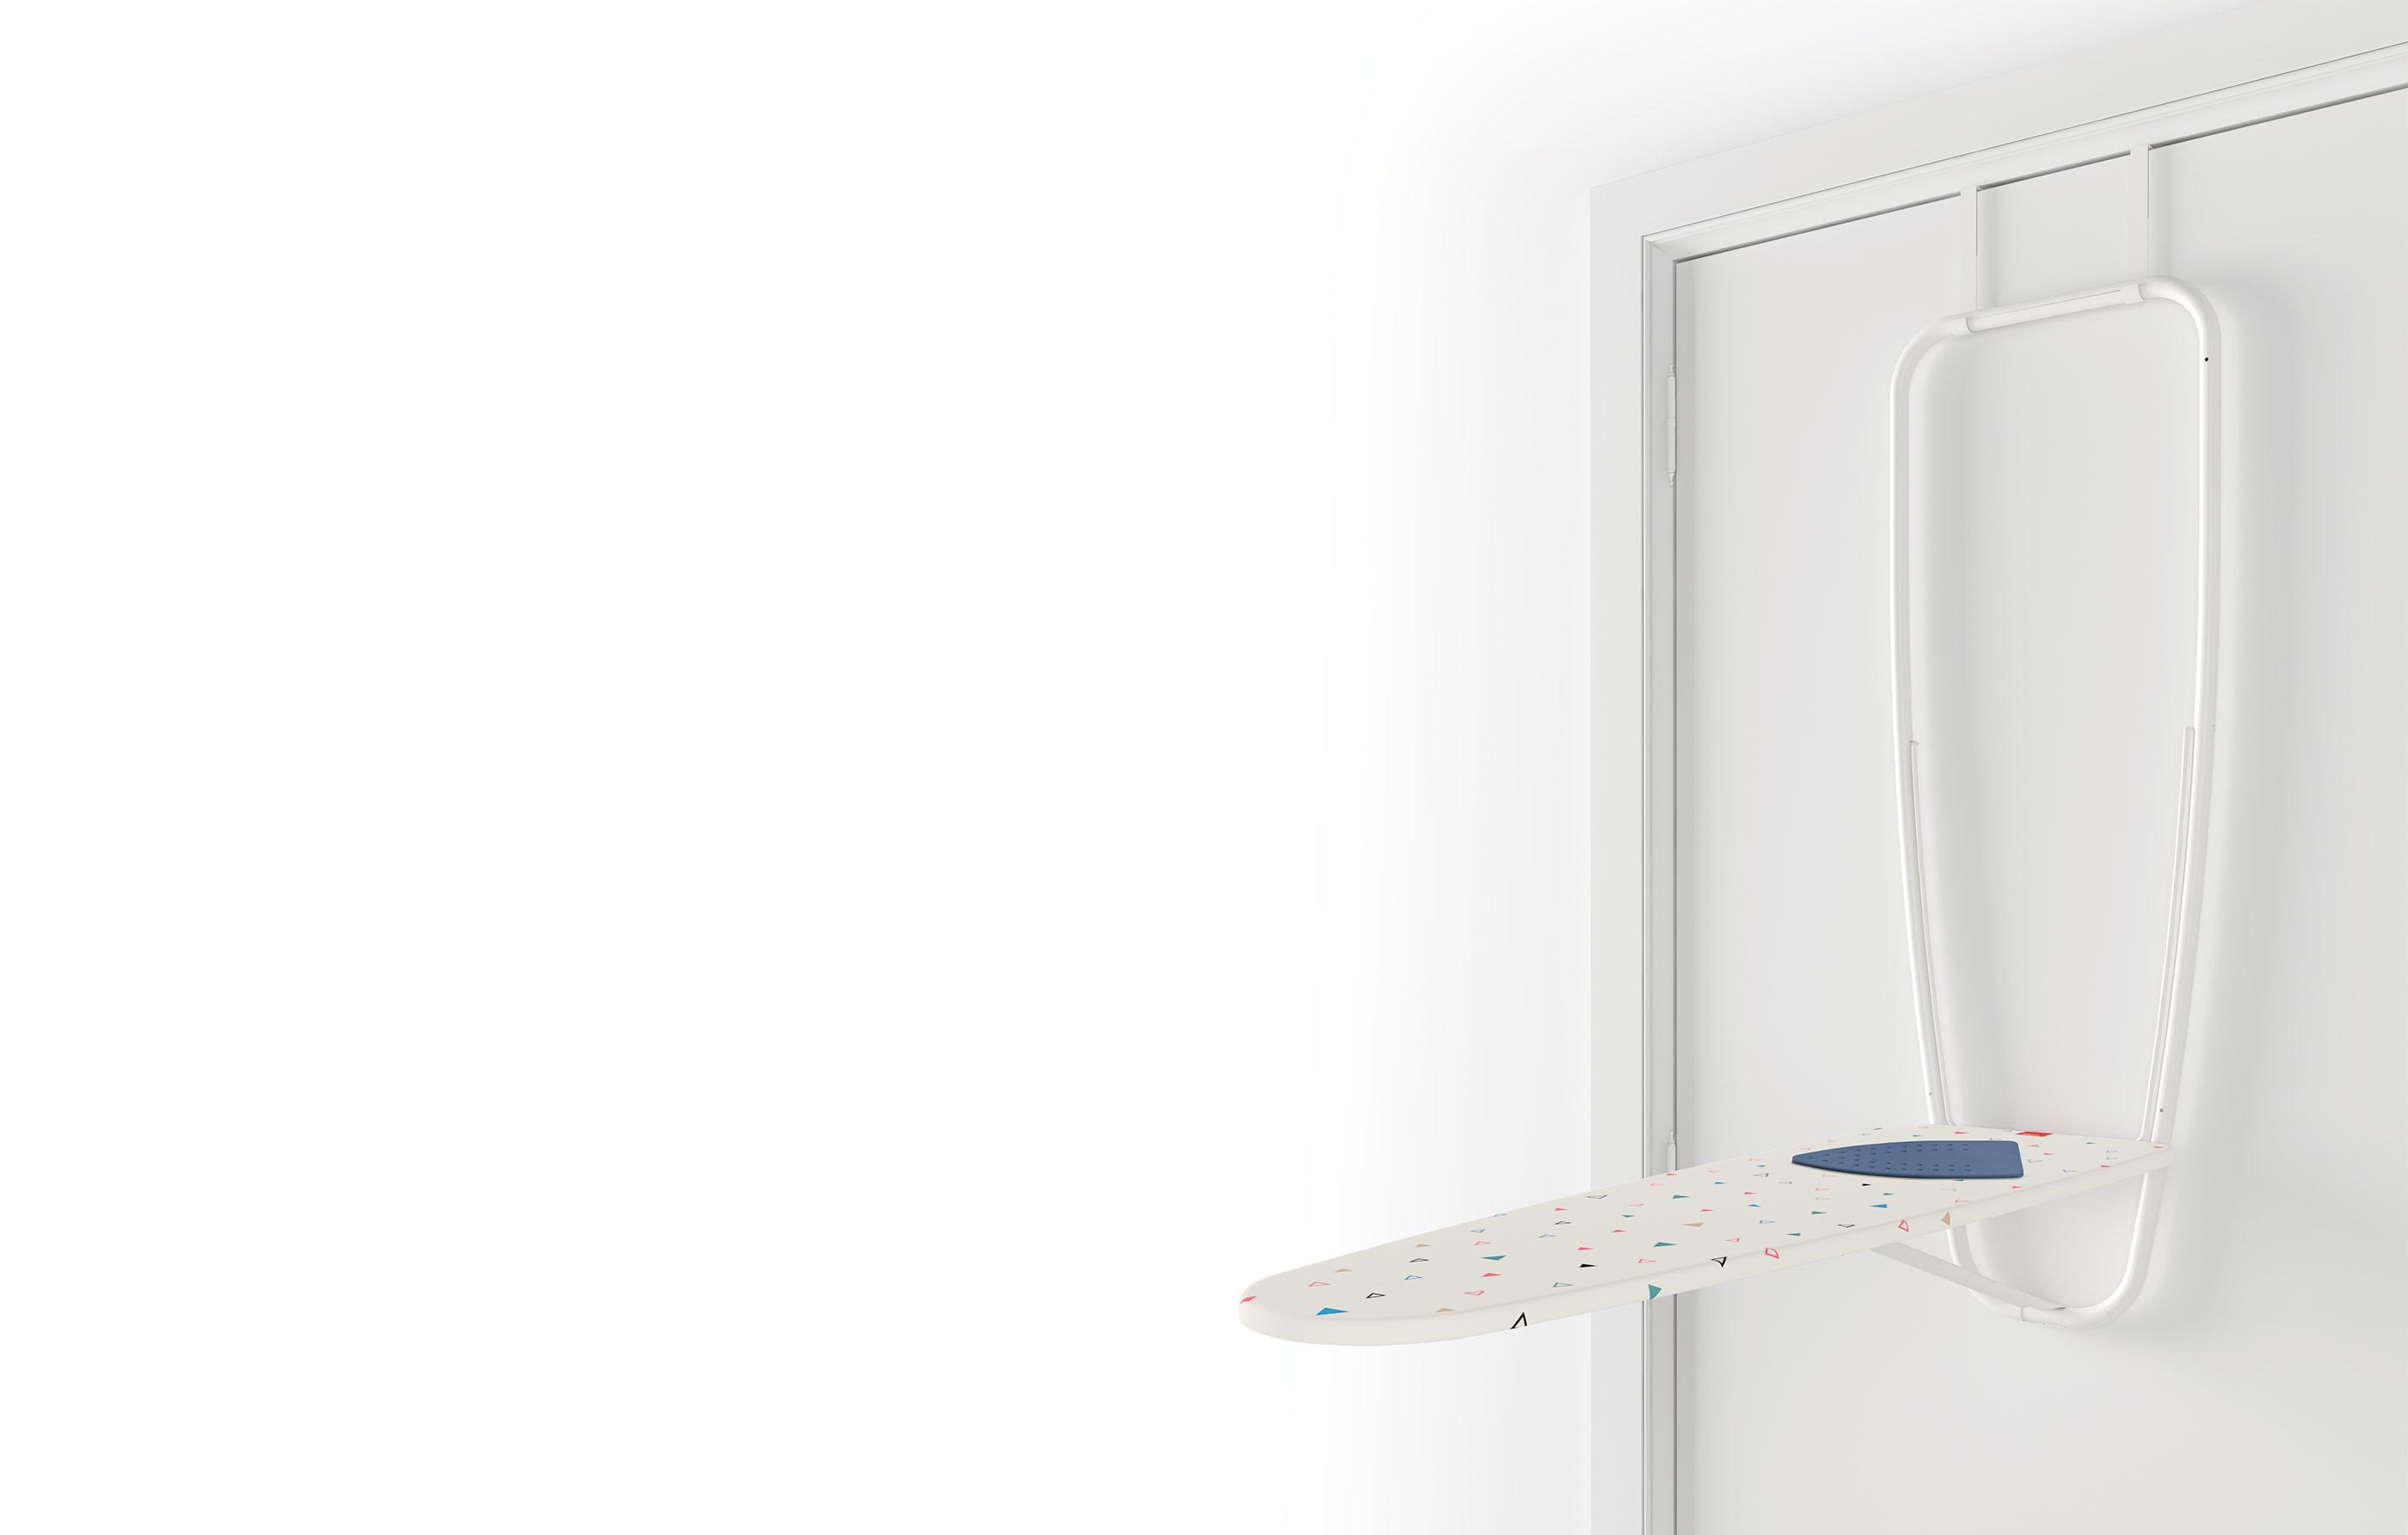 slider-tabla-planchar-3 Rayen | Soluciones innovadoras para el hogar | Tabla de planchar colgante | Rayen.com